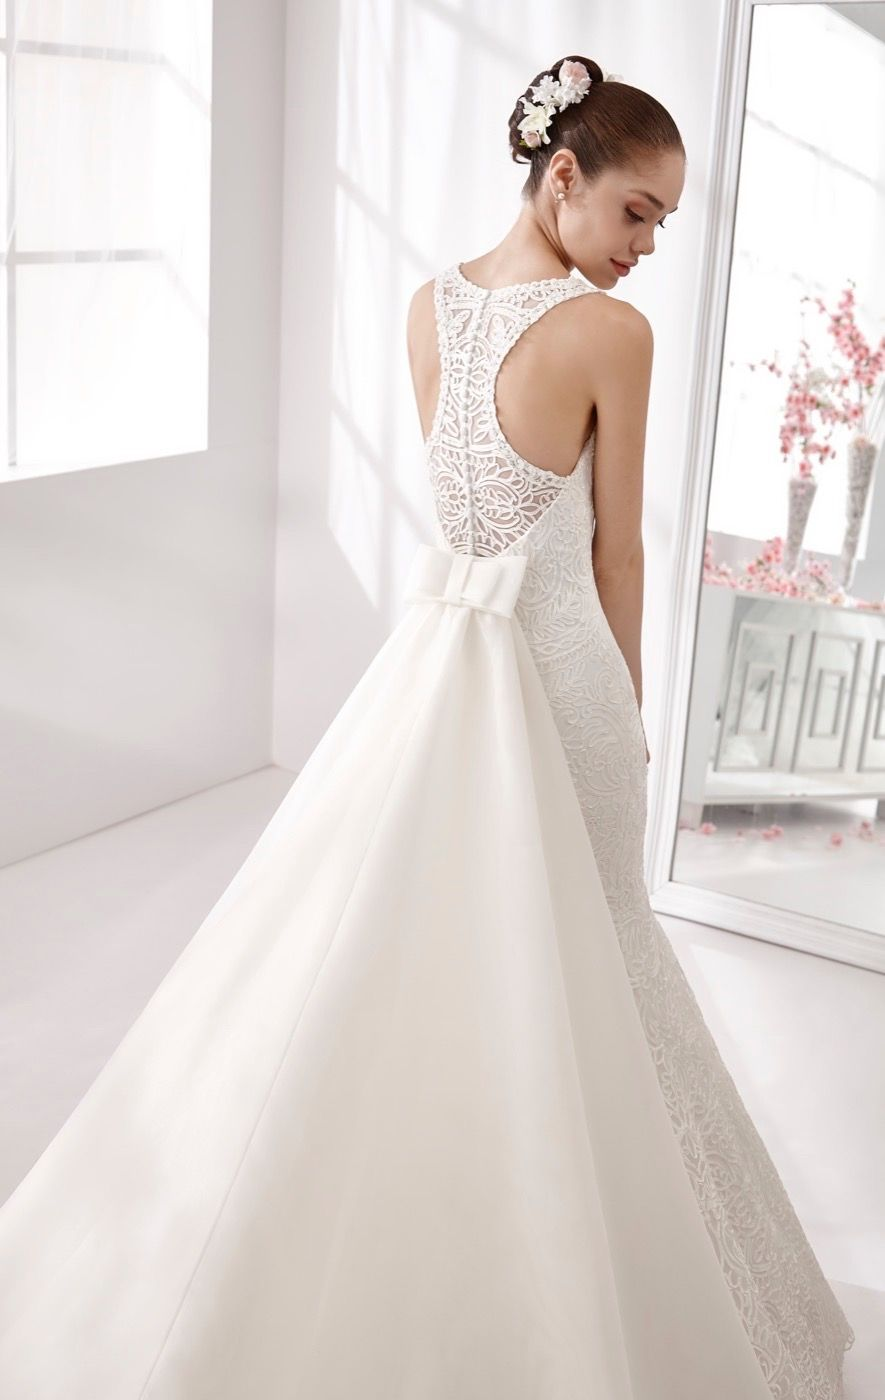 wedding  weddingdress  2016  collection  bride  bridal  brides  fashion   love  white  sposa  abitodasposa  bianco  marriage  7630815633